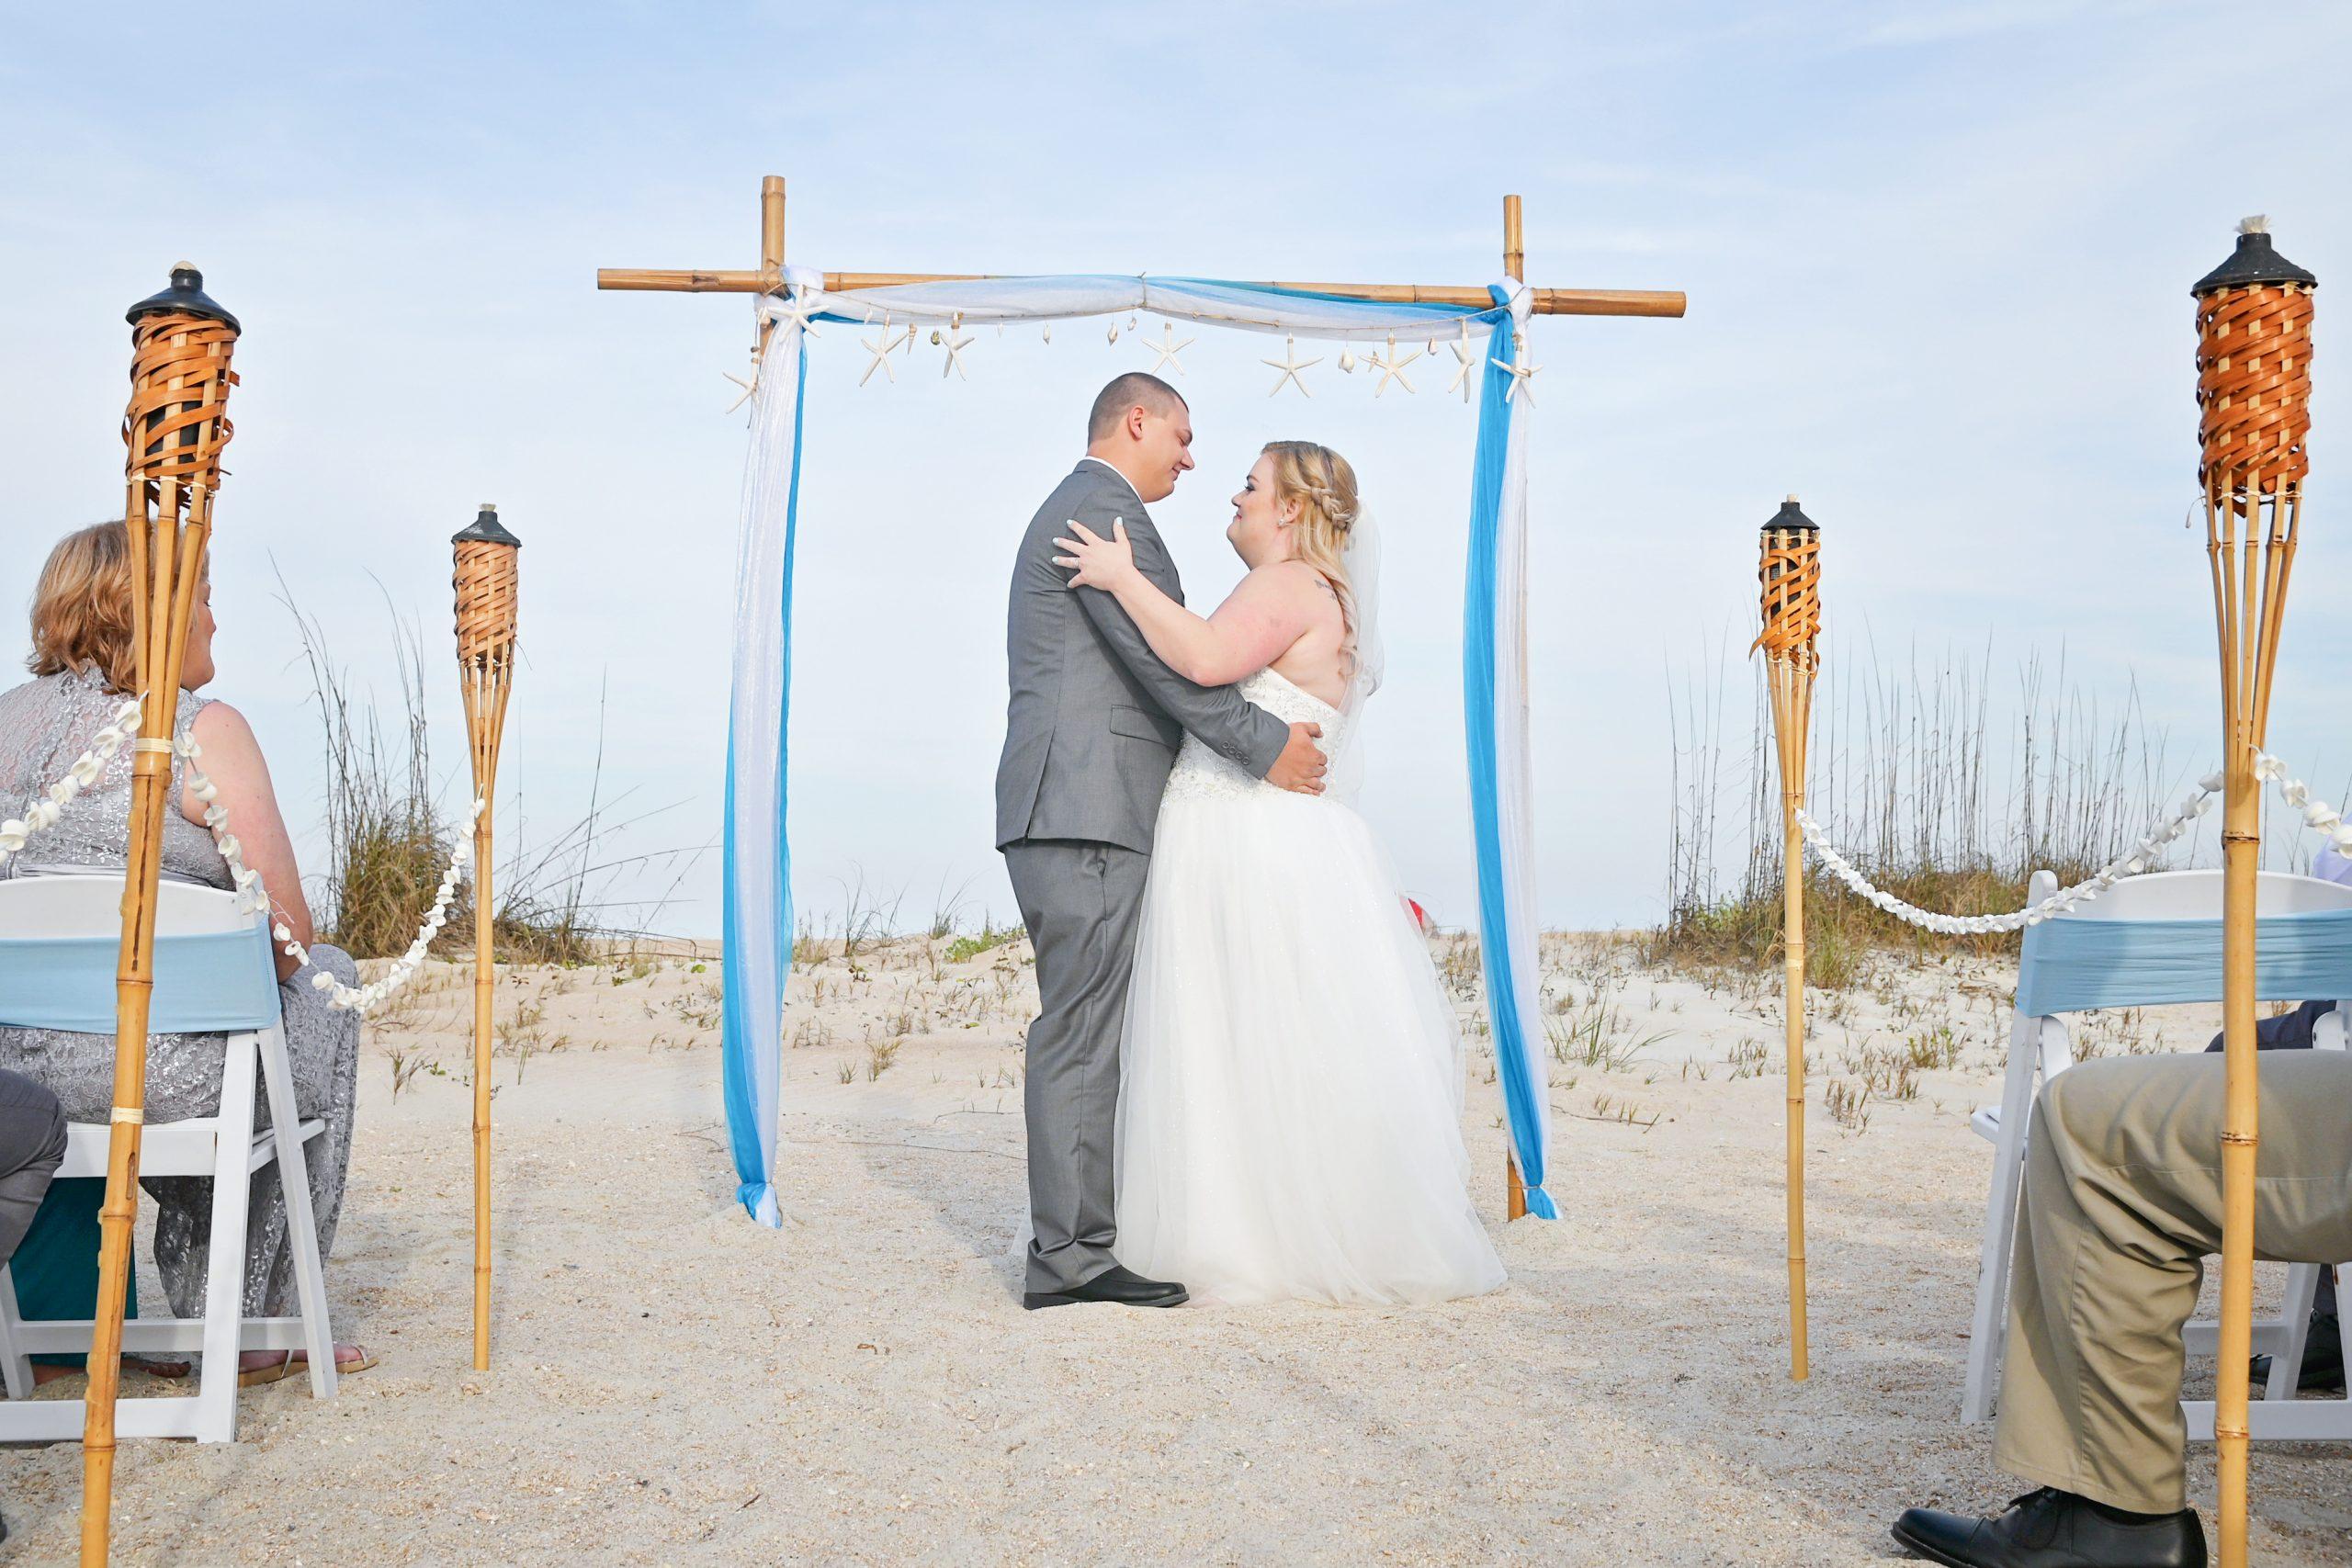 St Augustine Wedding couple says vows under arch on beach